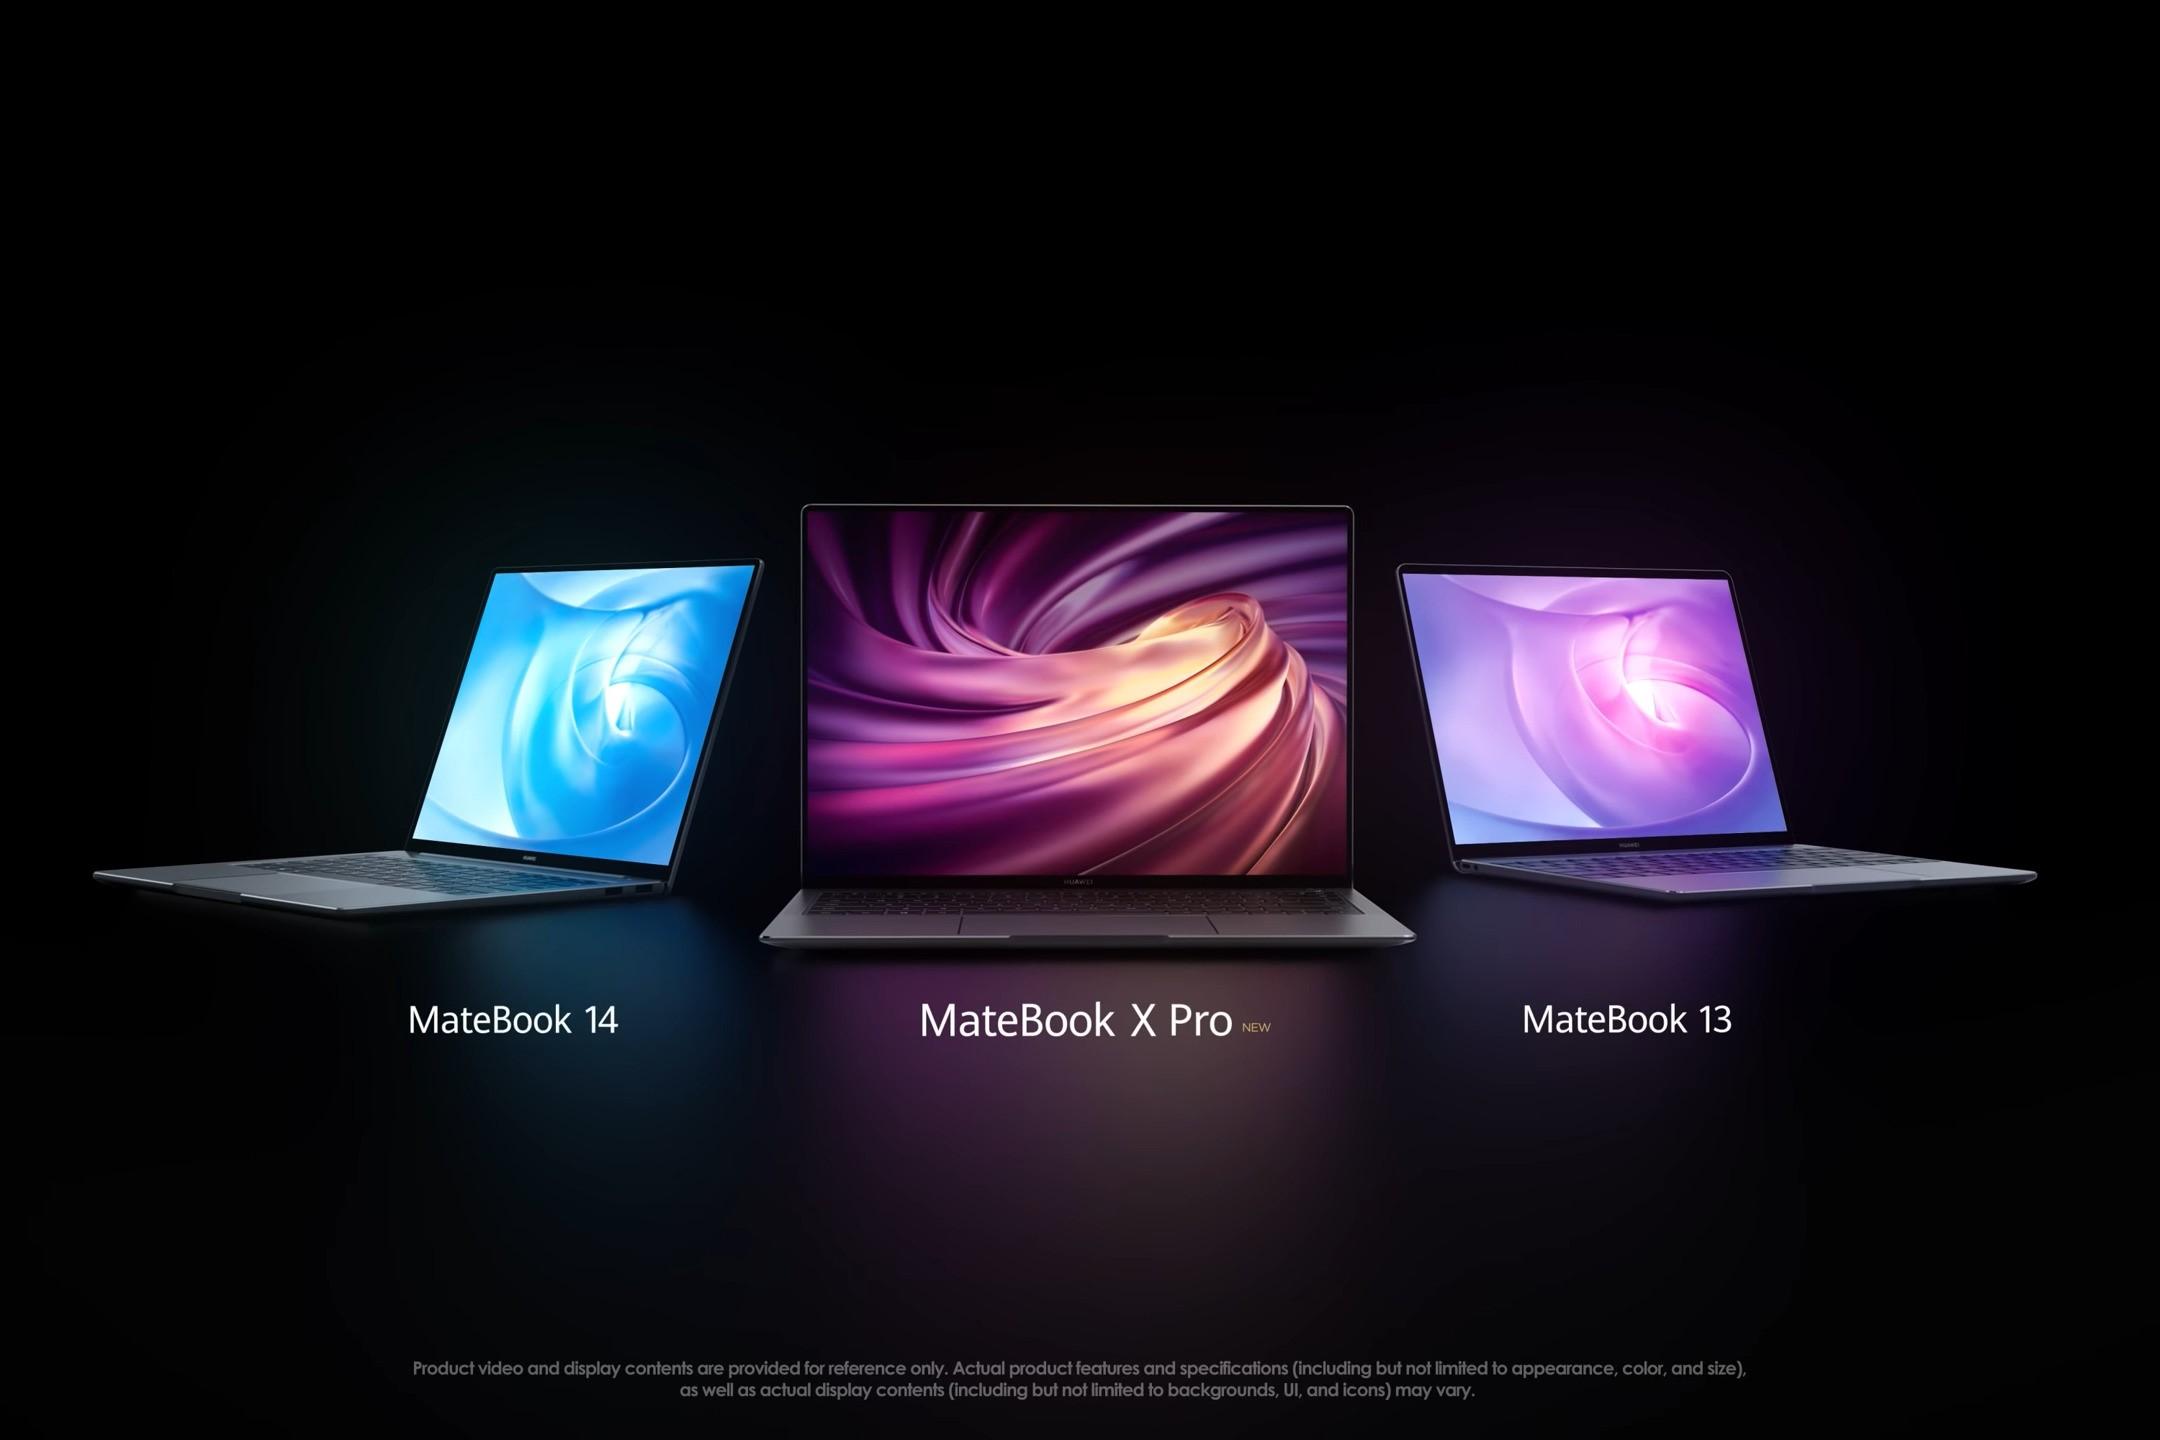 HuaweiMateBookMateBookMateBook-13MatebBook-14MateBook-X-Pro-X-Pro-2019technische-DatenM.jpg